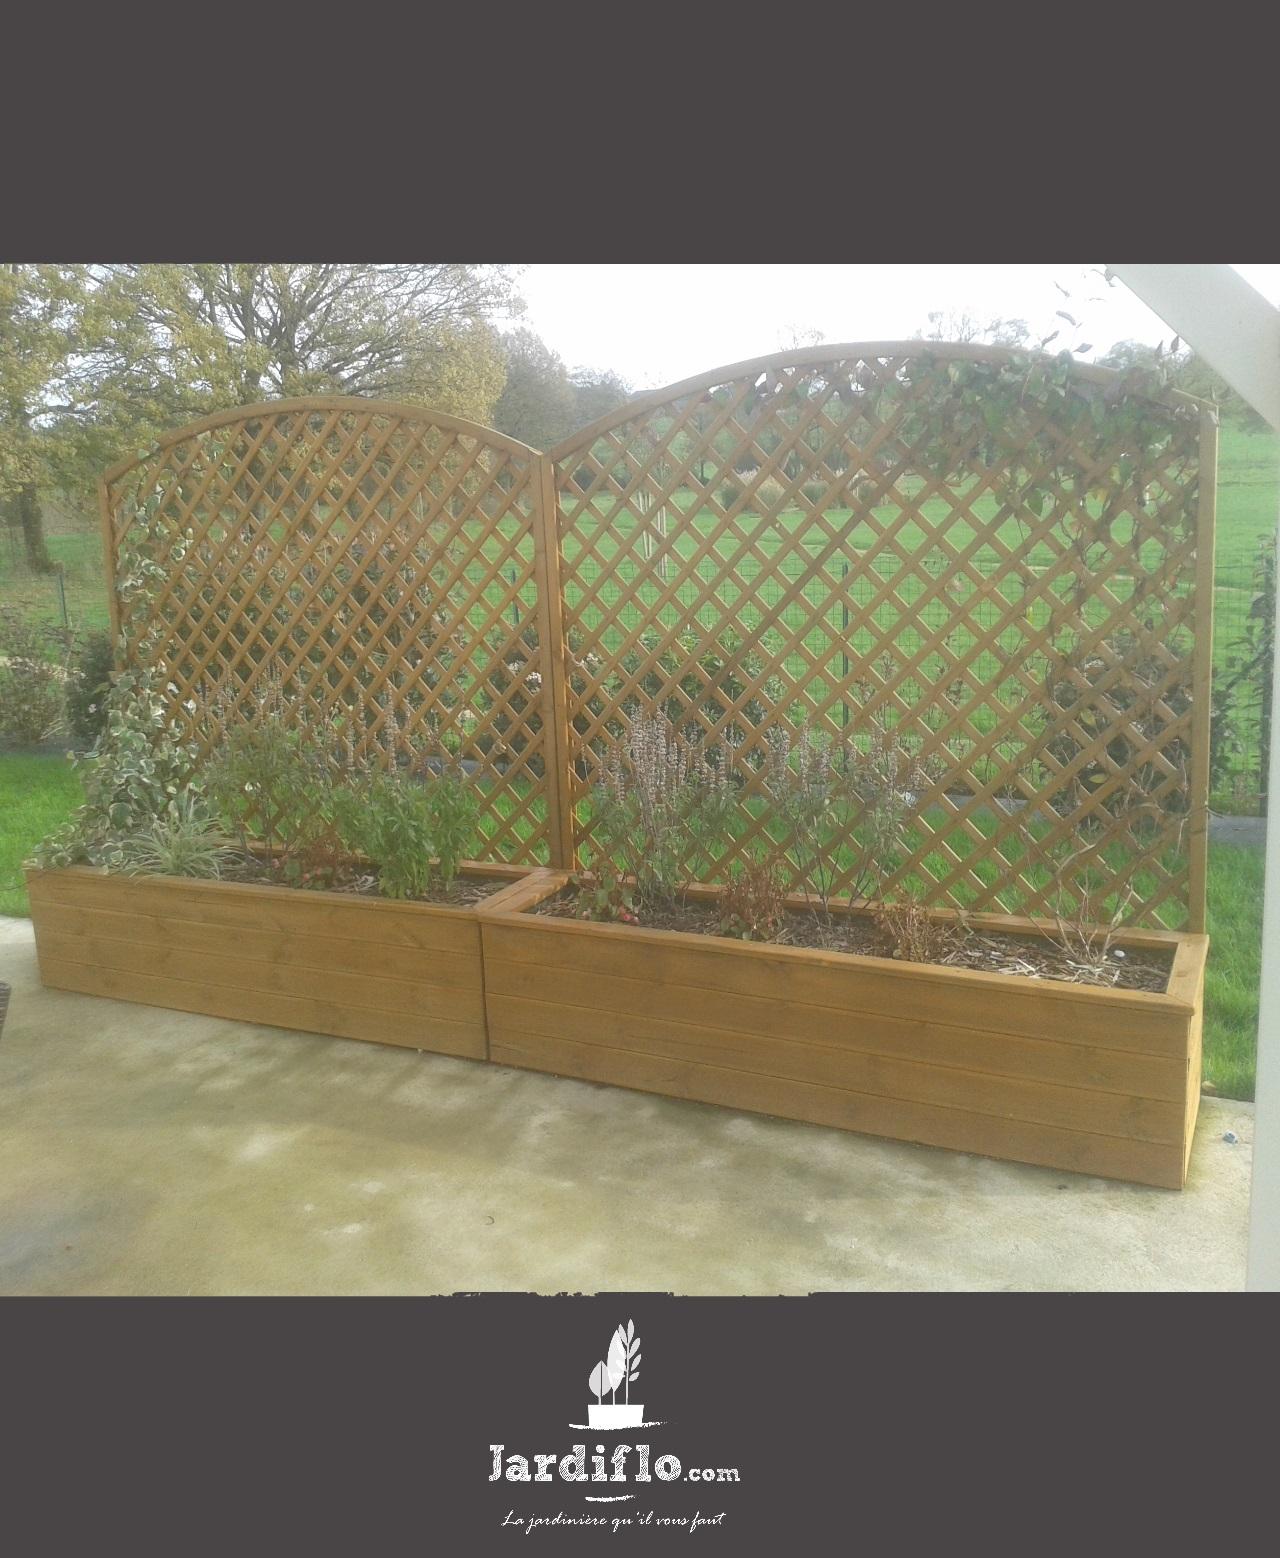 jardini re 180x45x40 180l standard treillis arrondi 180x180 jardiflo. Black Bedroom Furniture Sets. Home Design Ideas